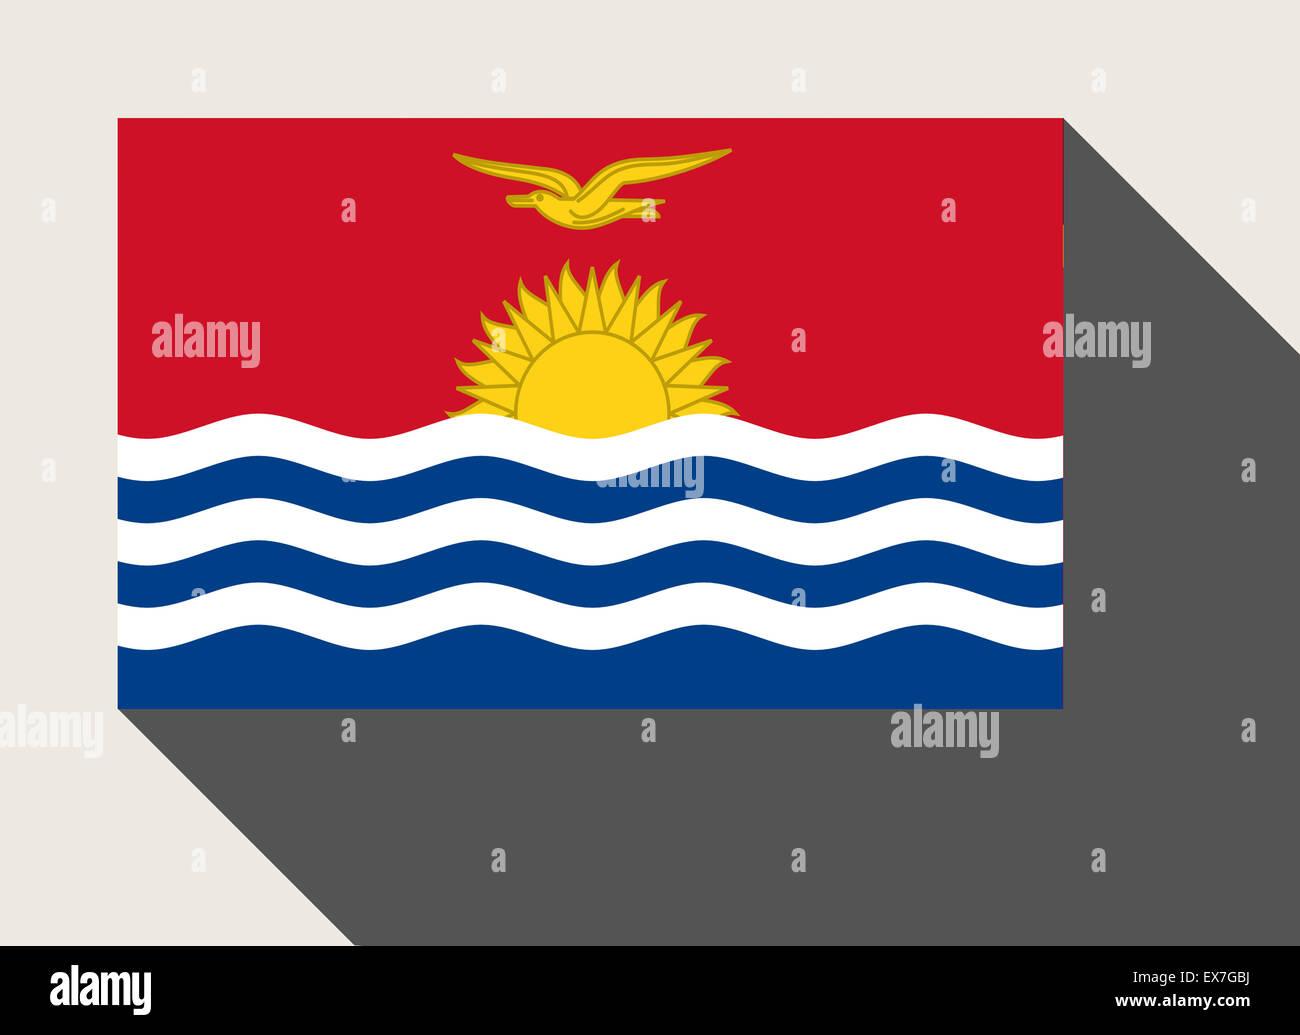 Kiribati flag in flat web design style. Stock Photo